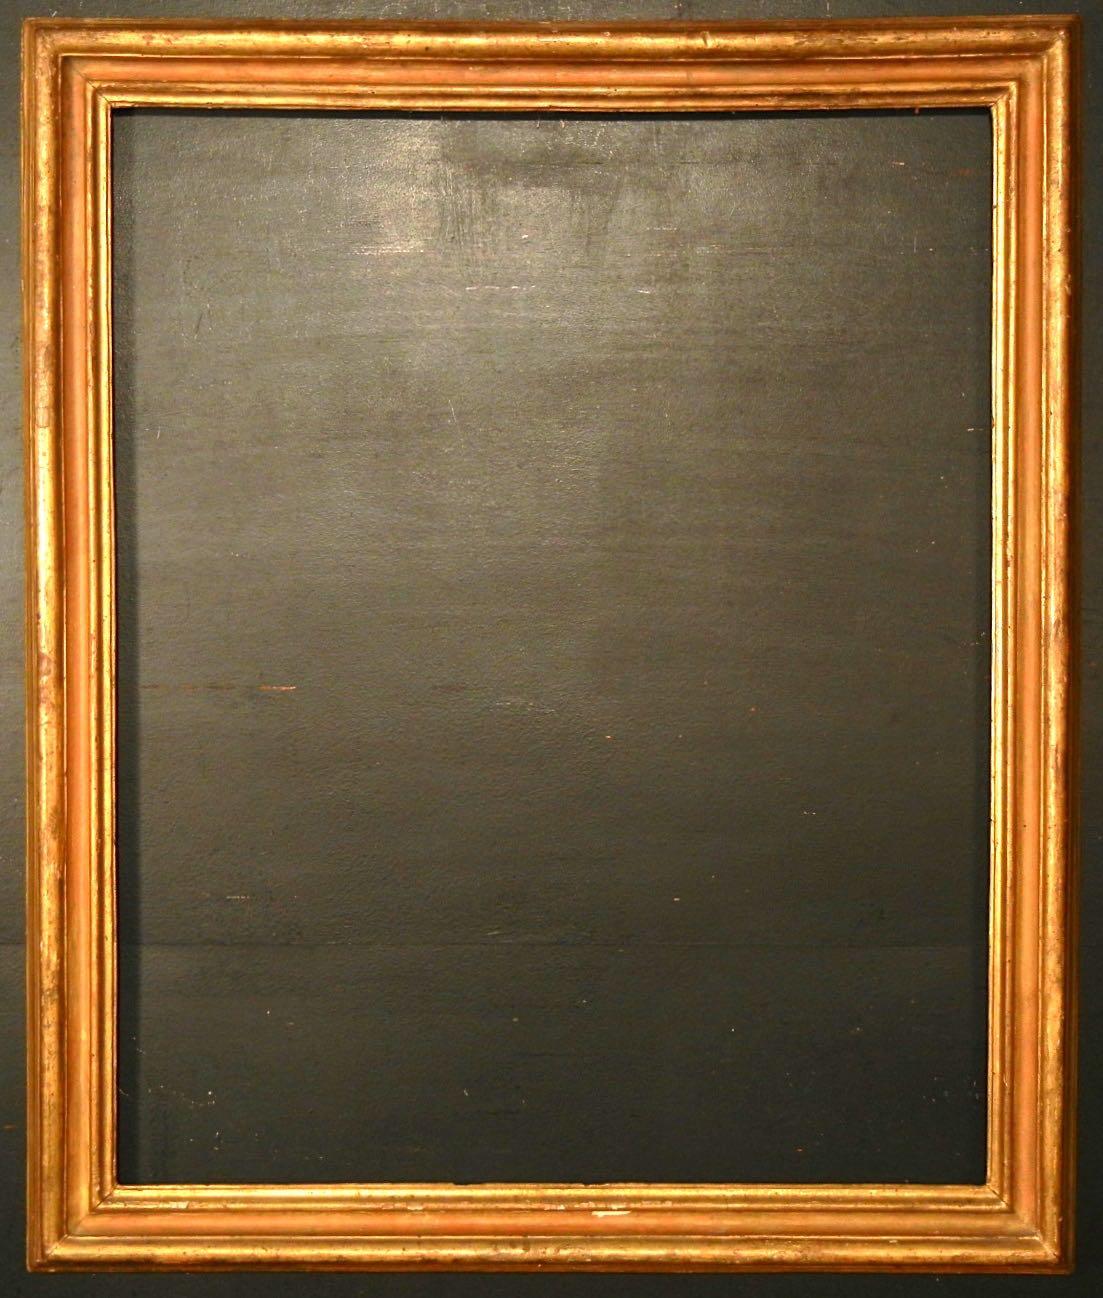 18th Century Italian Frame | Ammi Ribar :: Antiques & Fine Period Frames